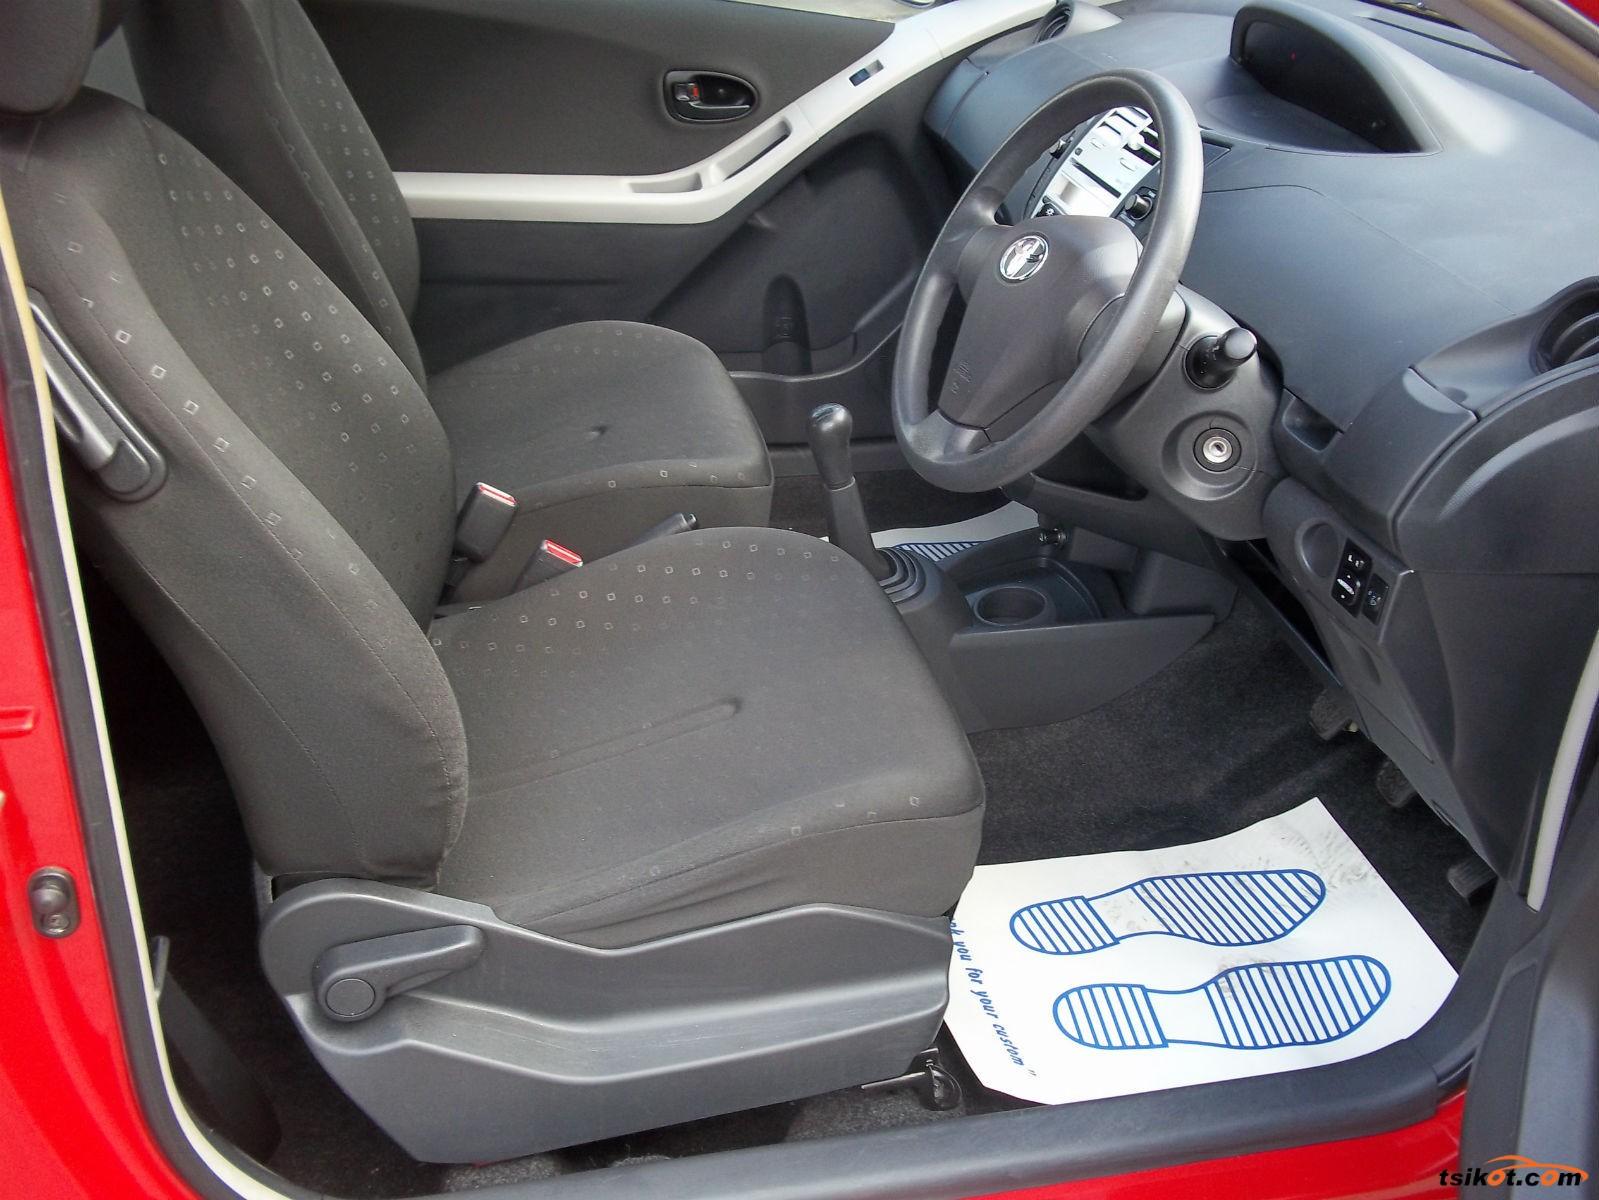 Toyota Yaris 2011 - 6